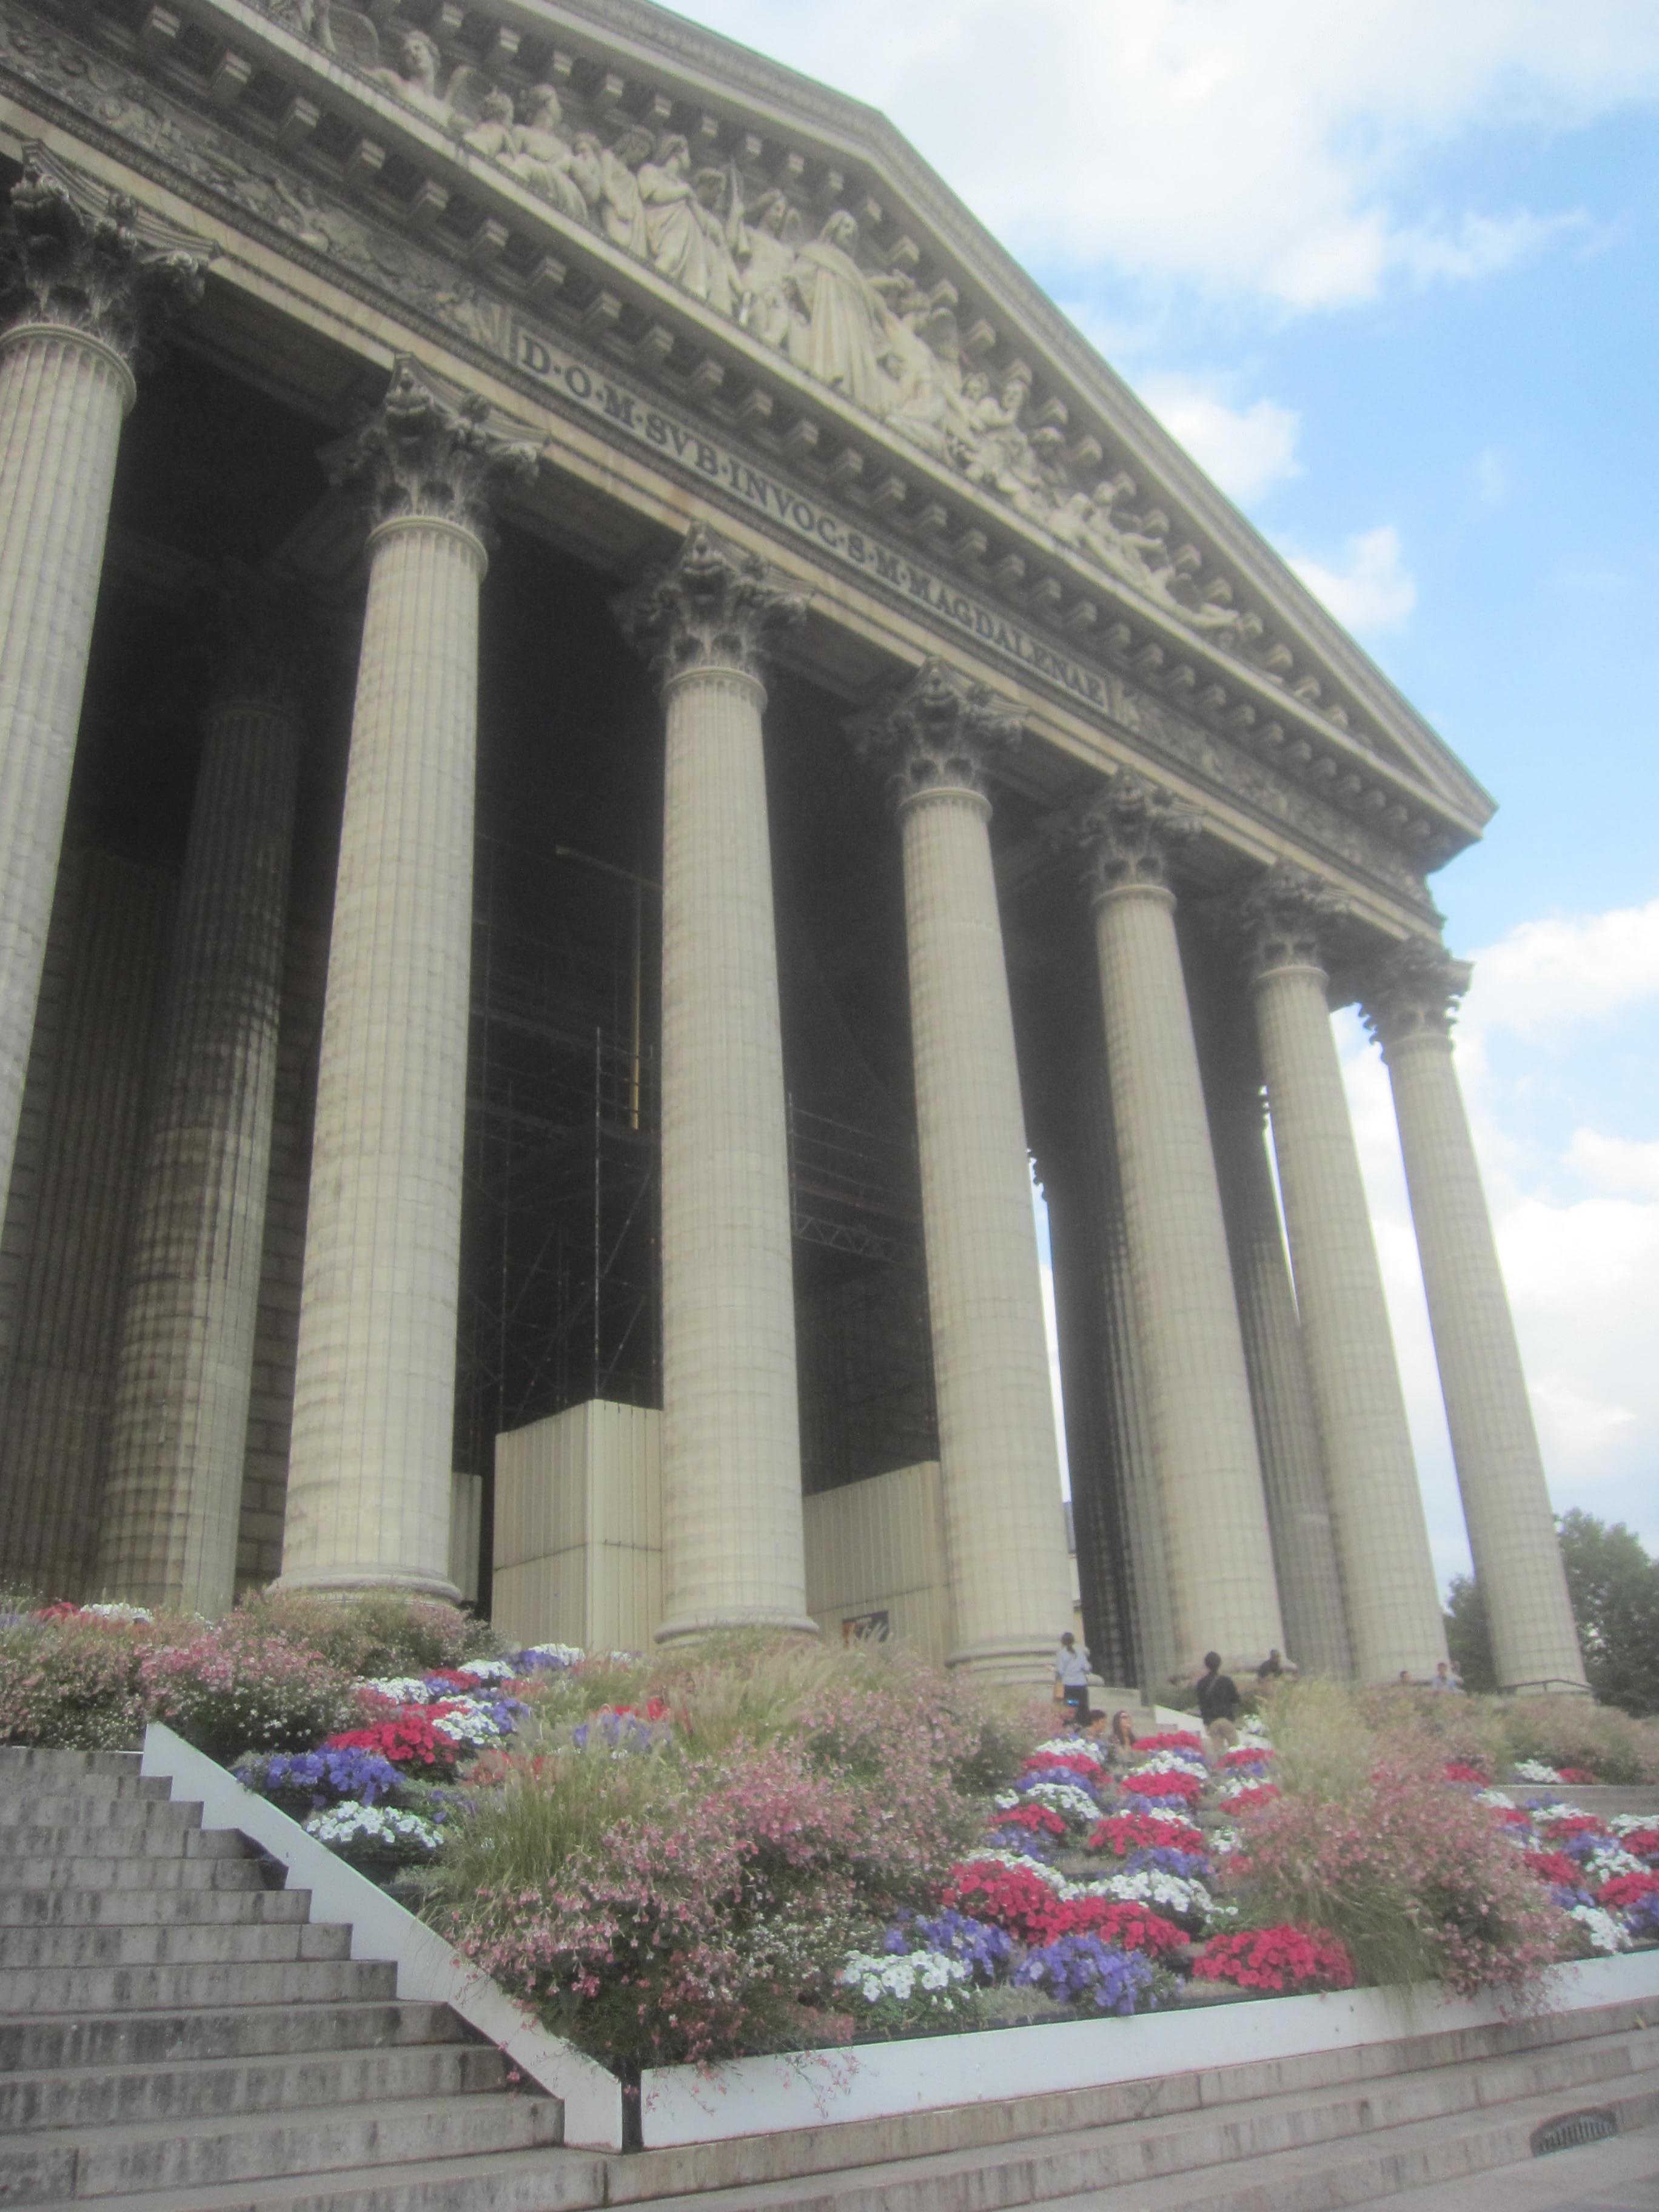 Paris glise de la madeleine disway - L orangerie la madeleine ...